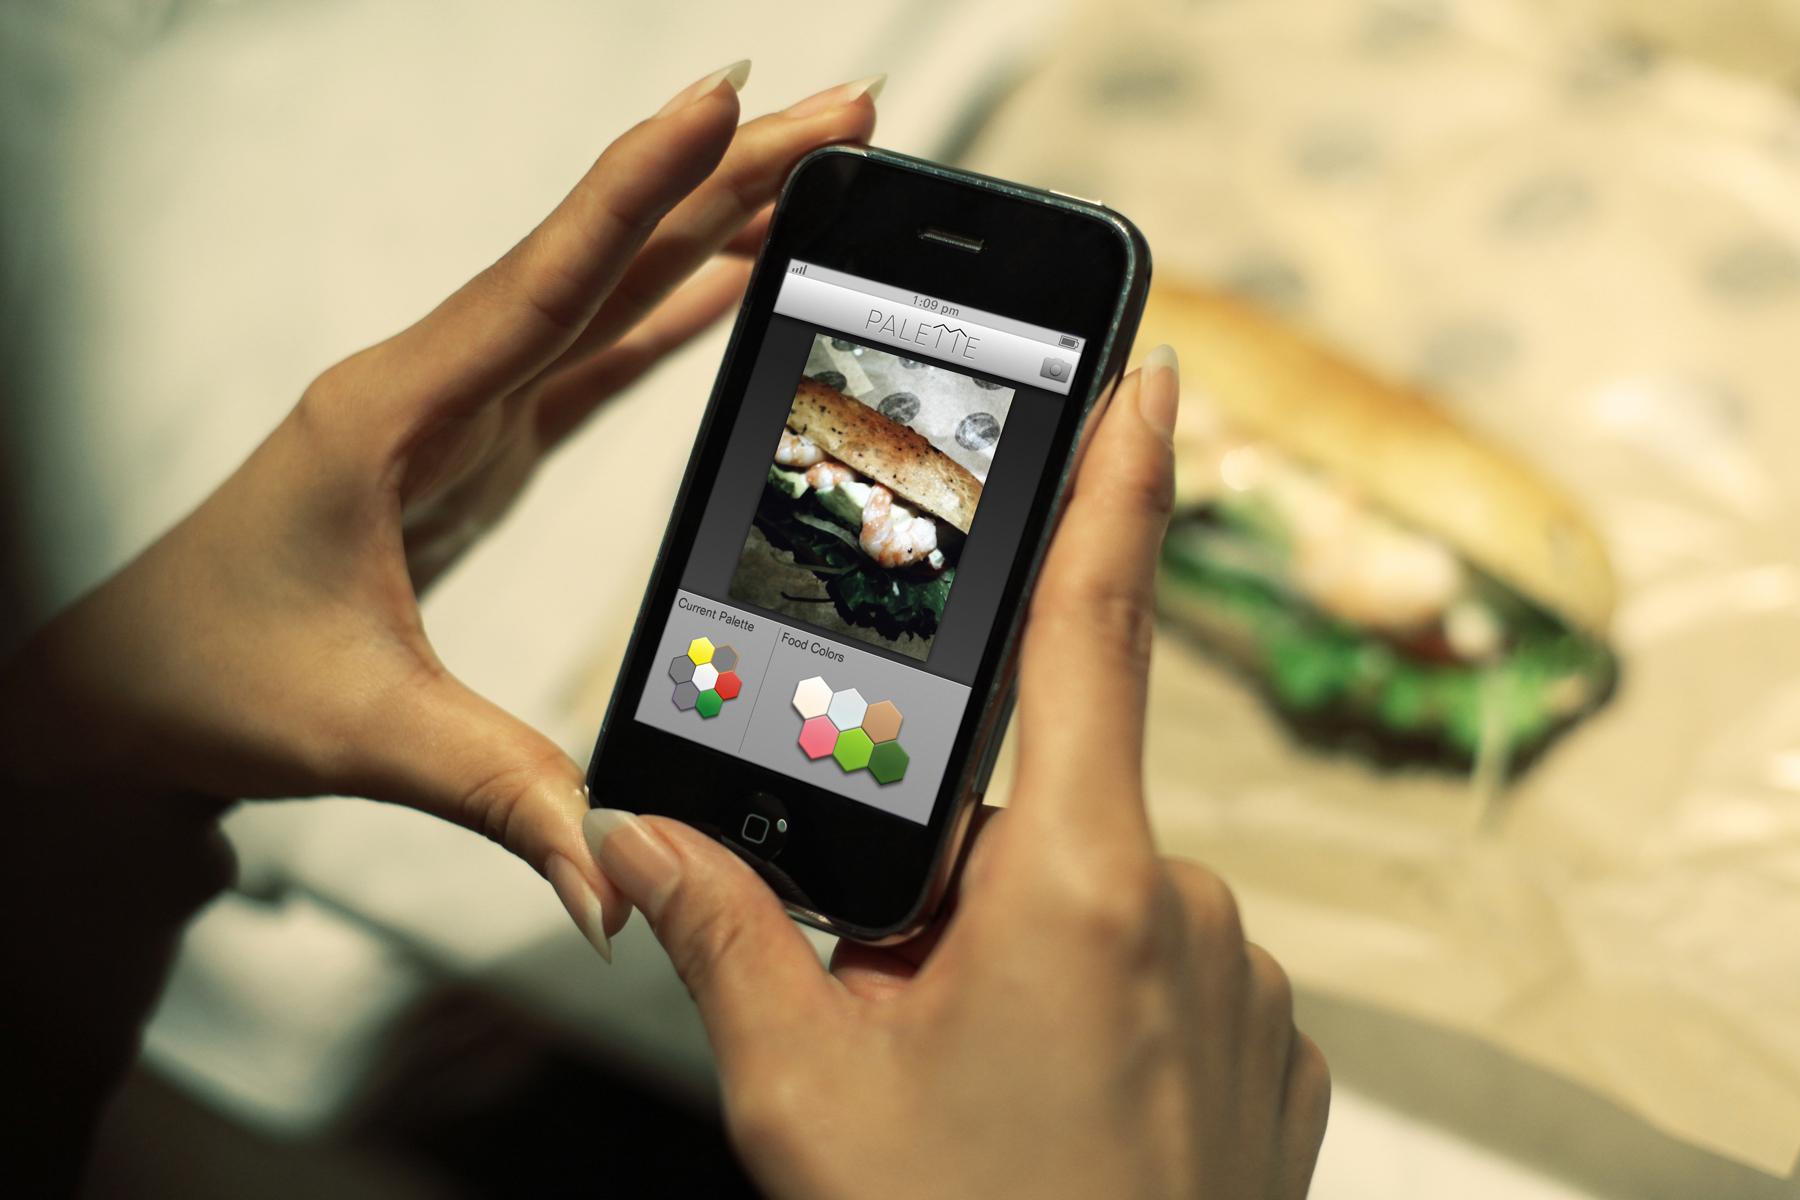 take_picture.jpg